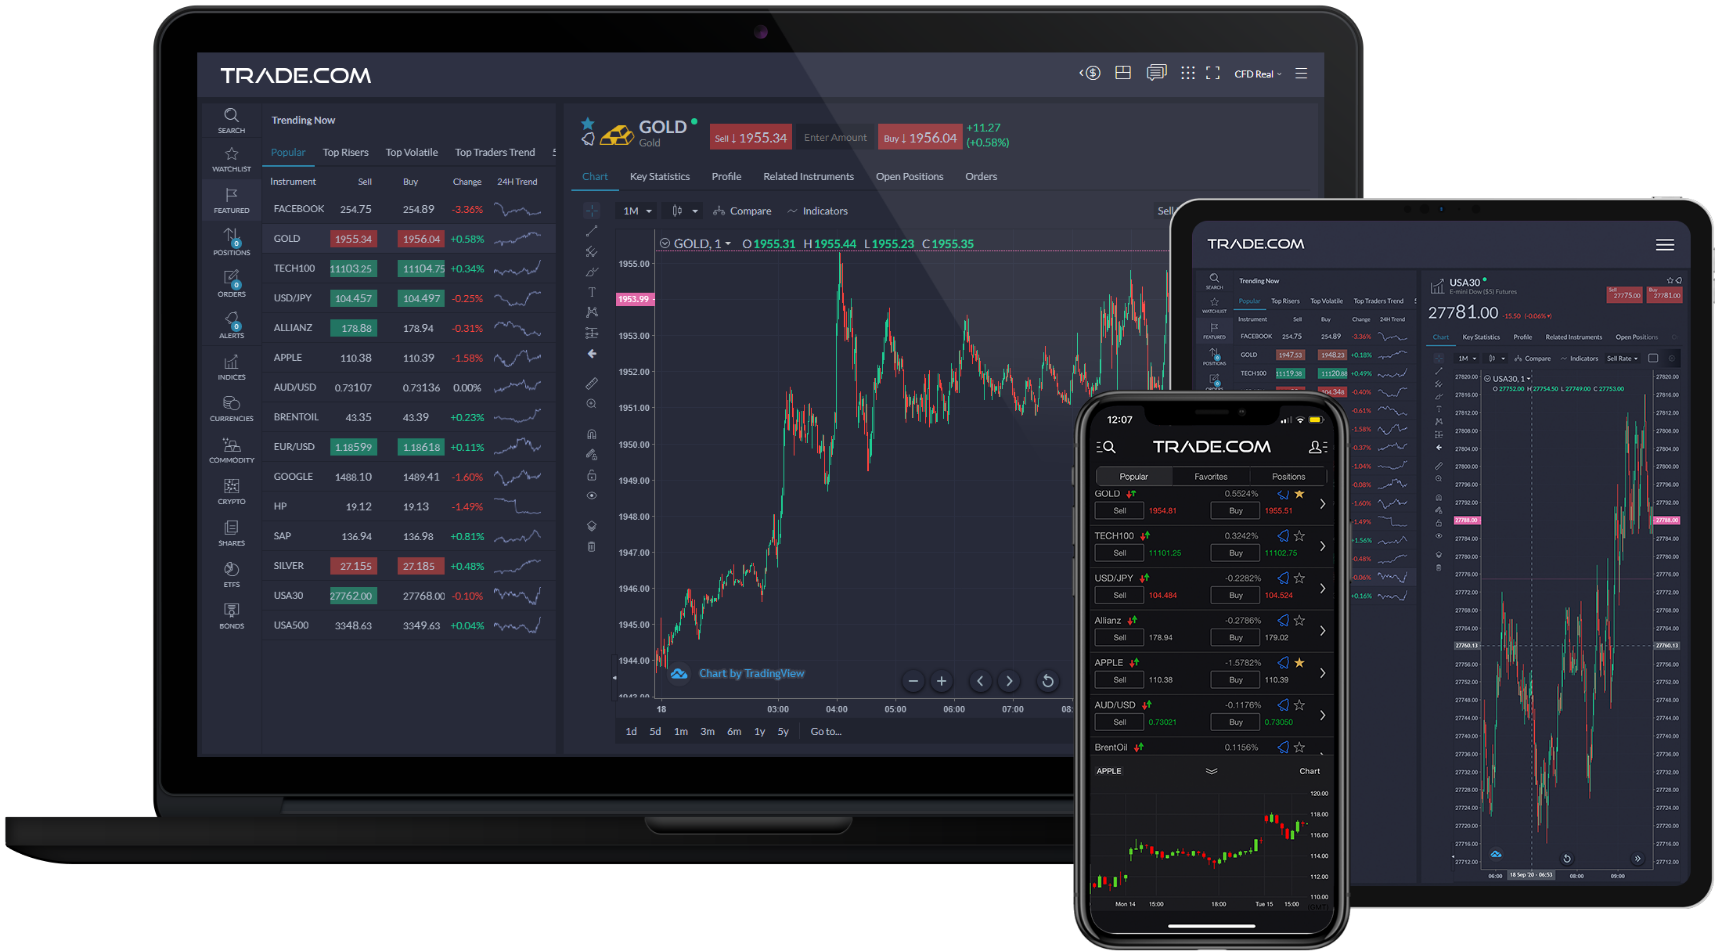 Recensione trade.com broker